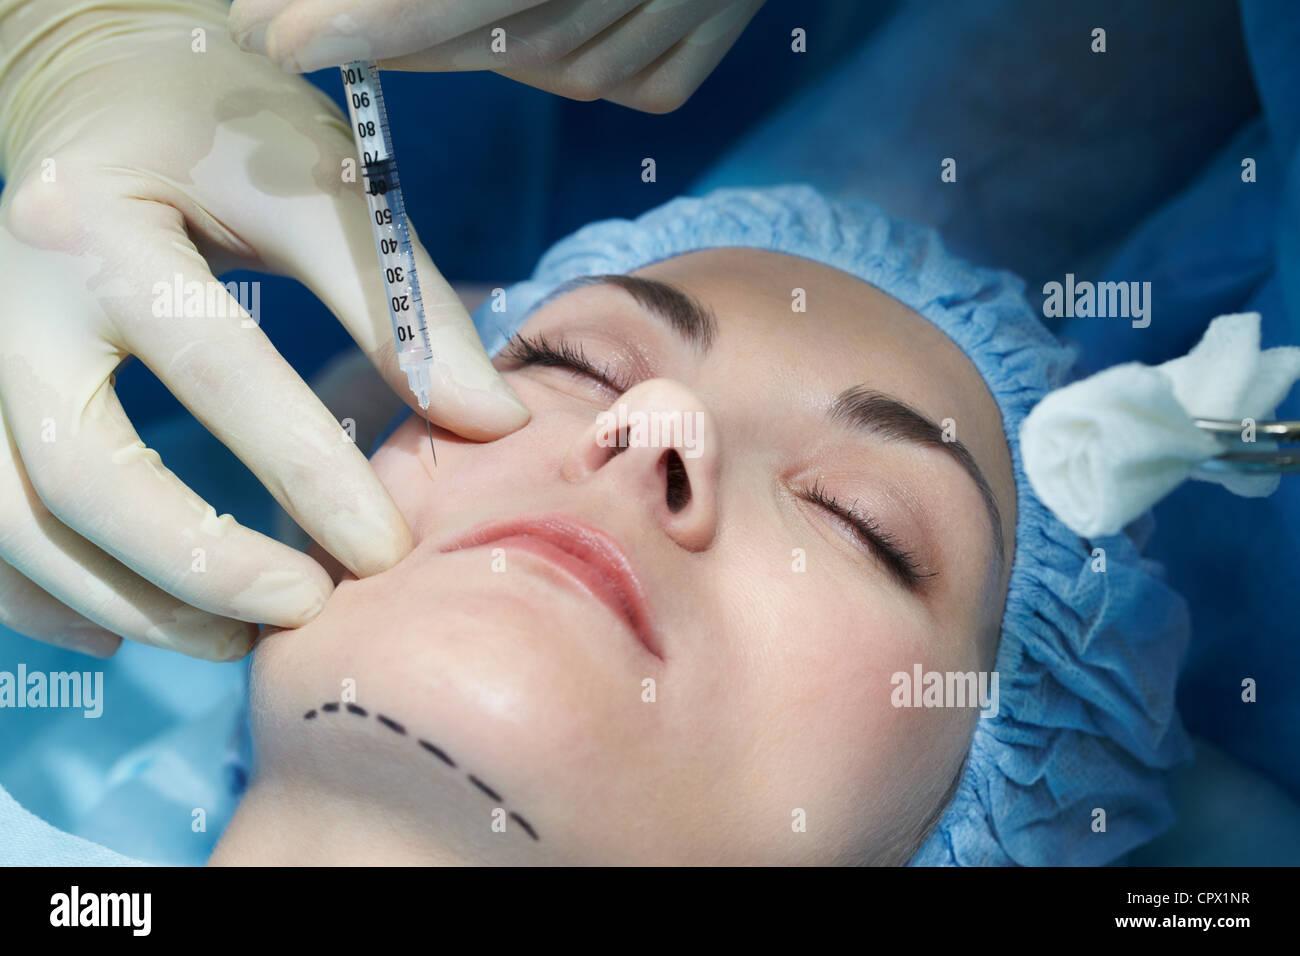 Young woman having facial plastic surgery - Stock Image